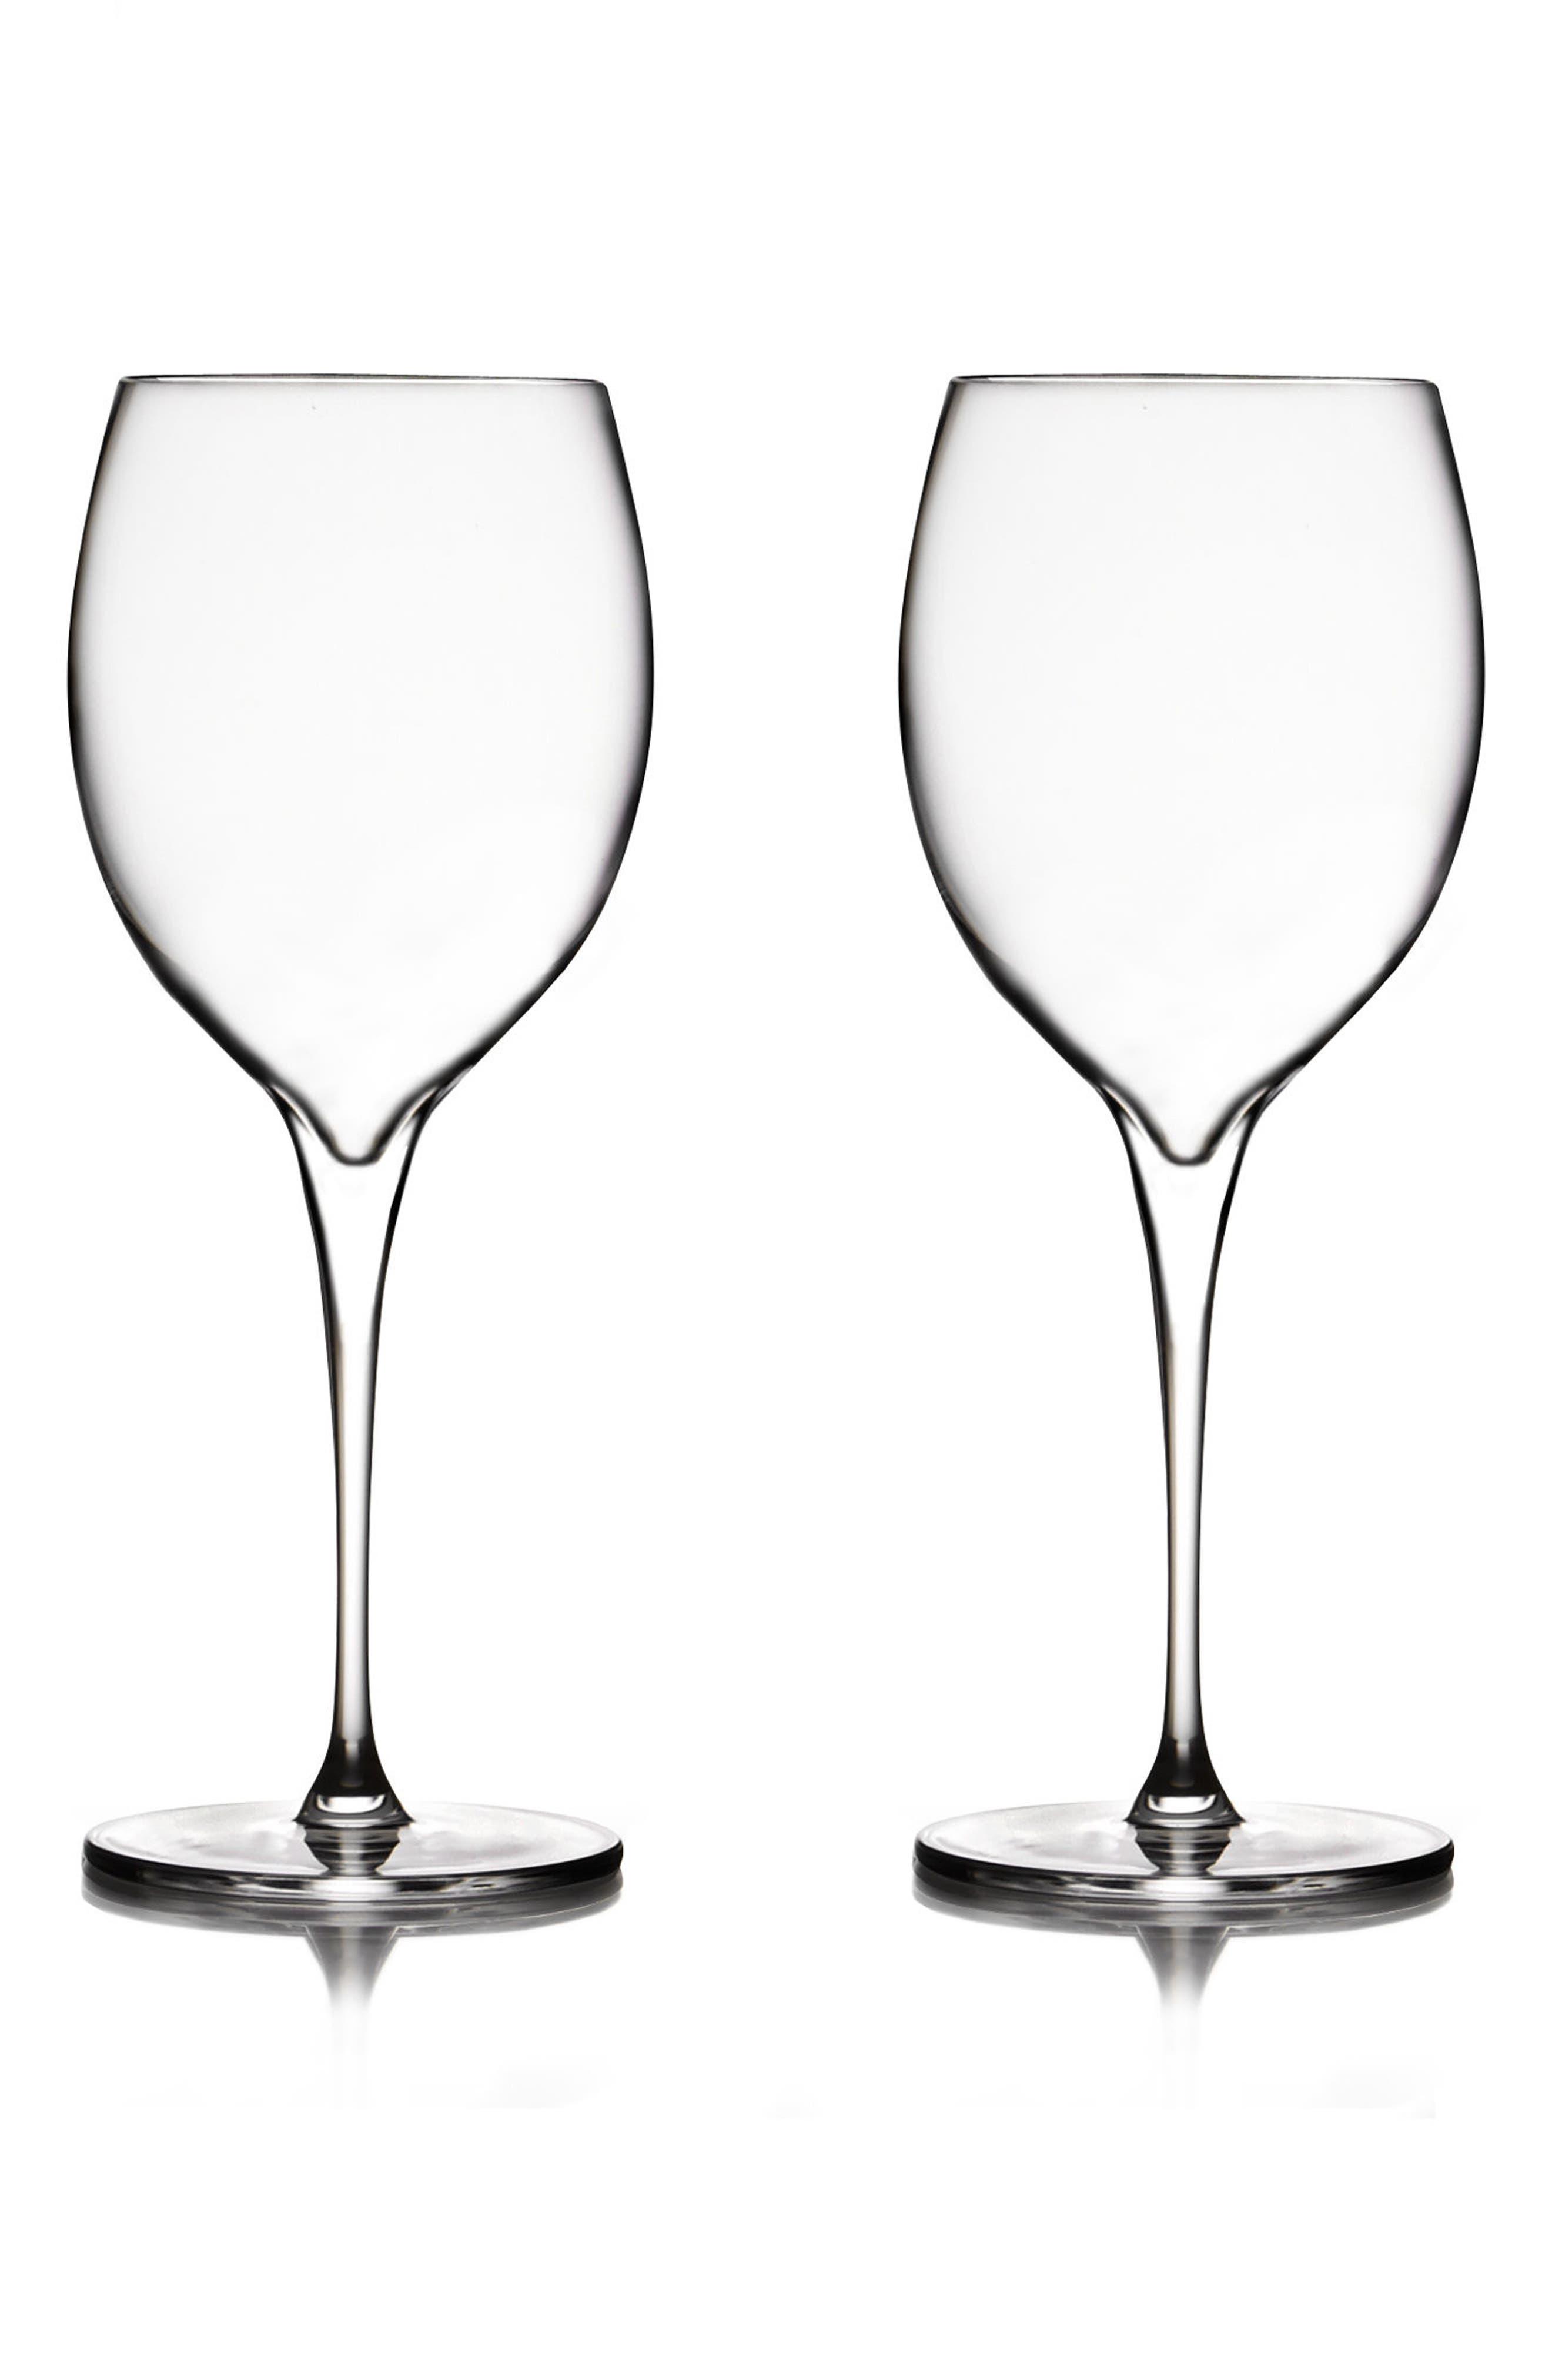 Vie Set of 2 Chardonnay Glasses,                             Main thumbnail 1, color,                             100